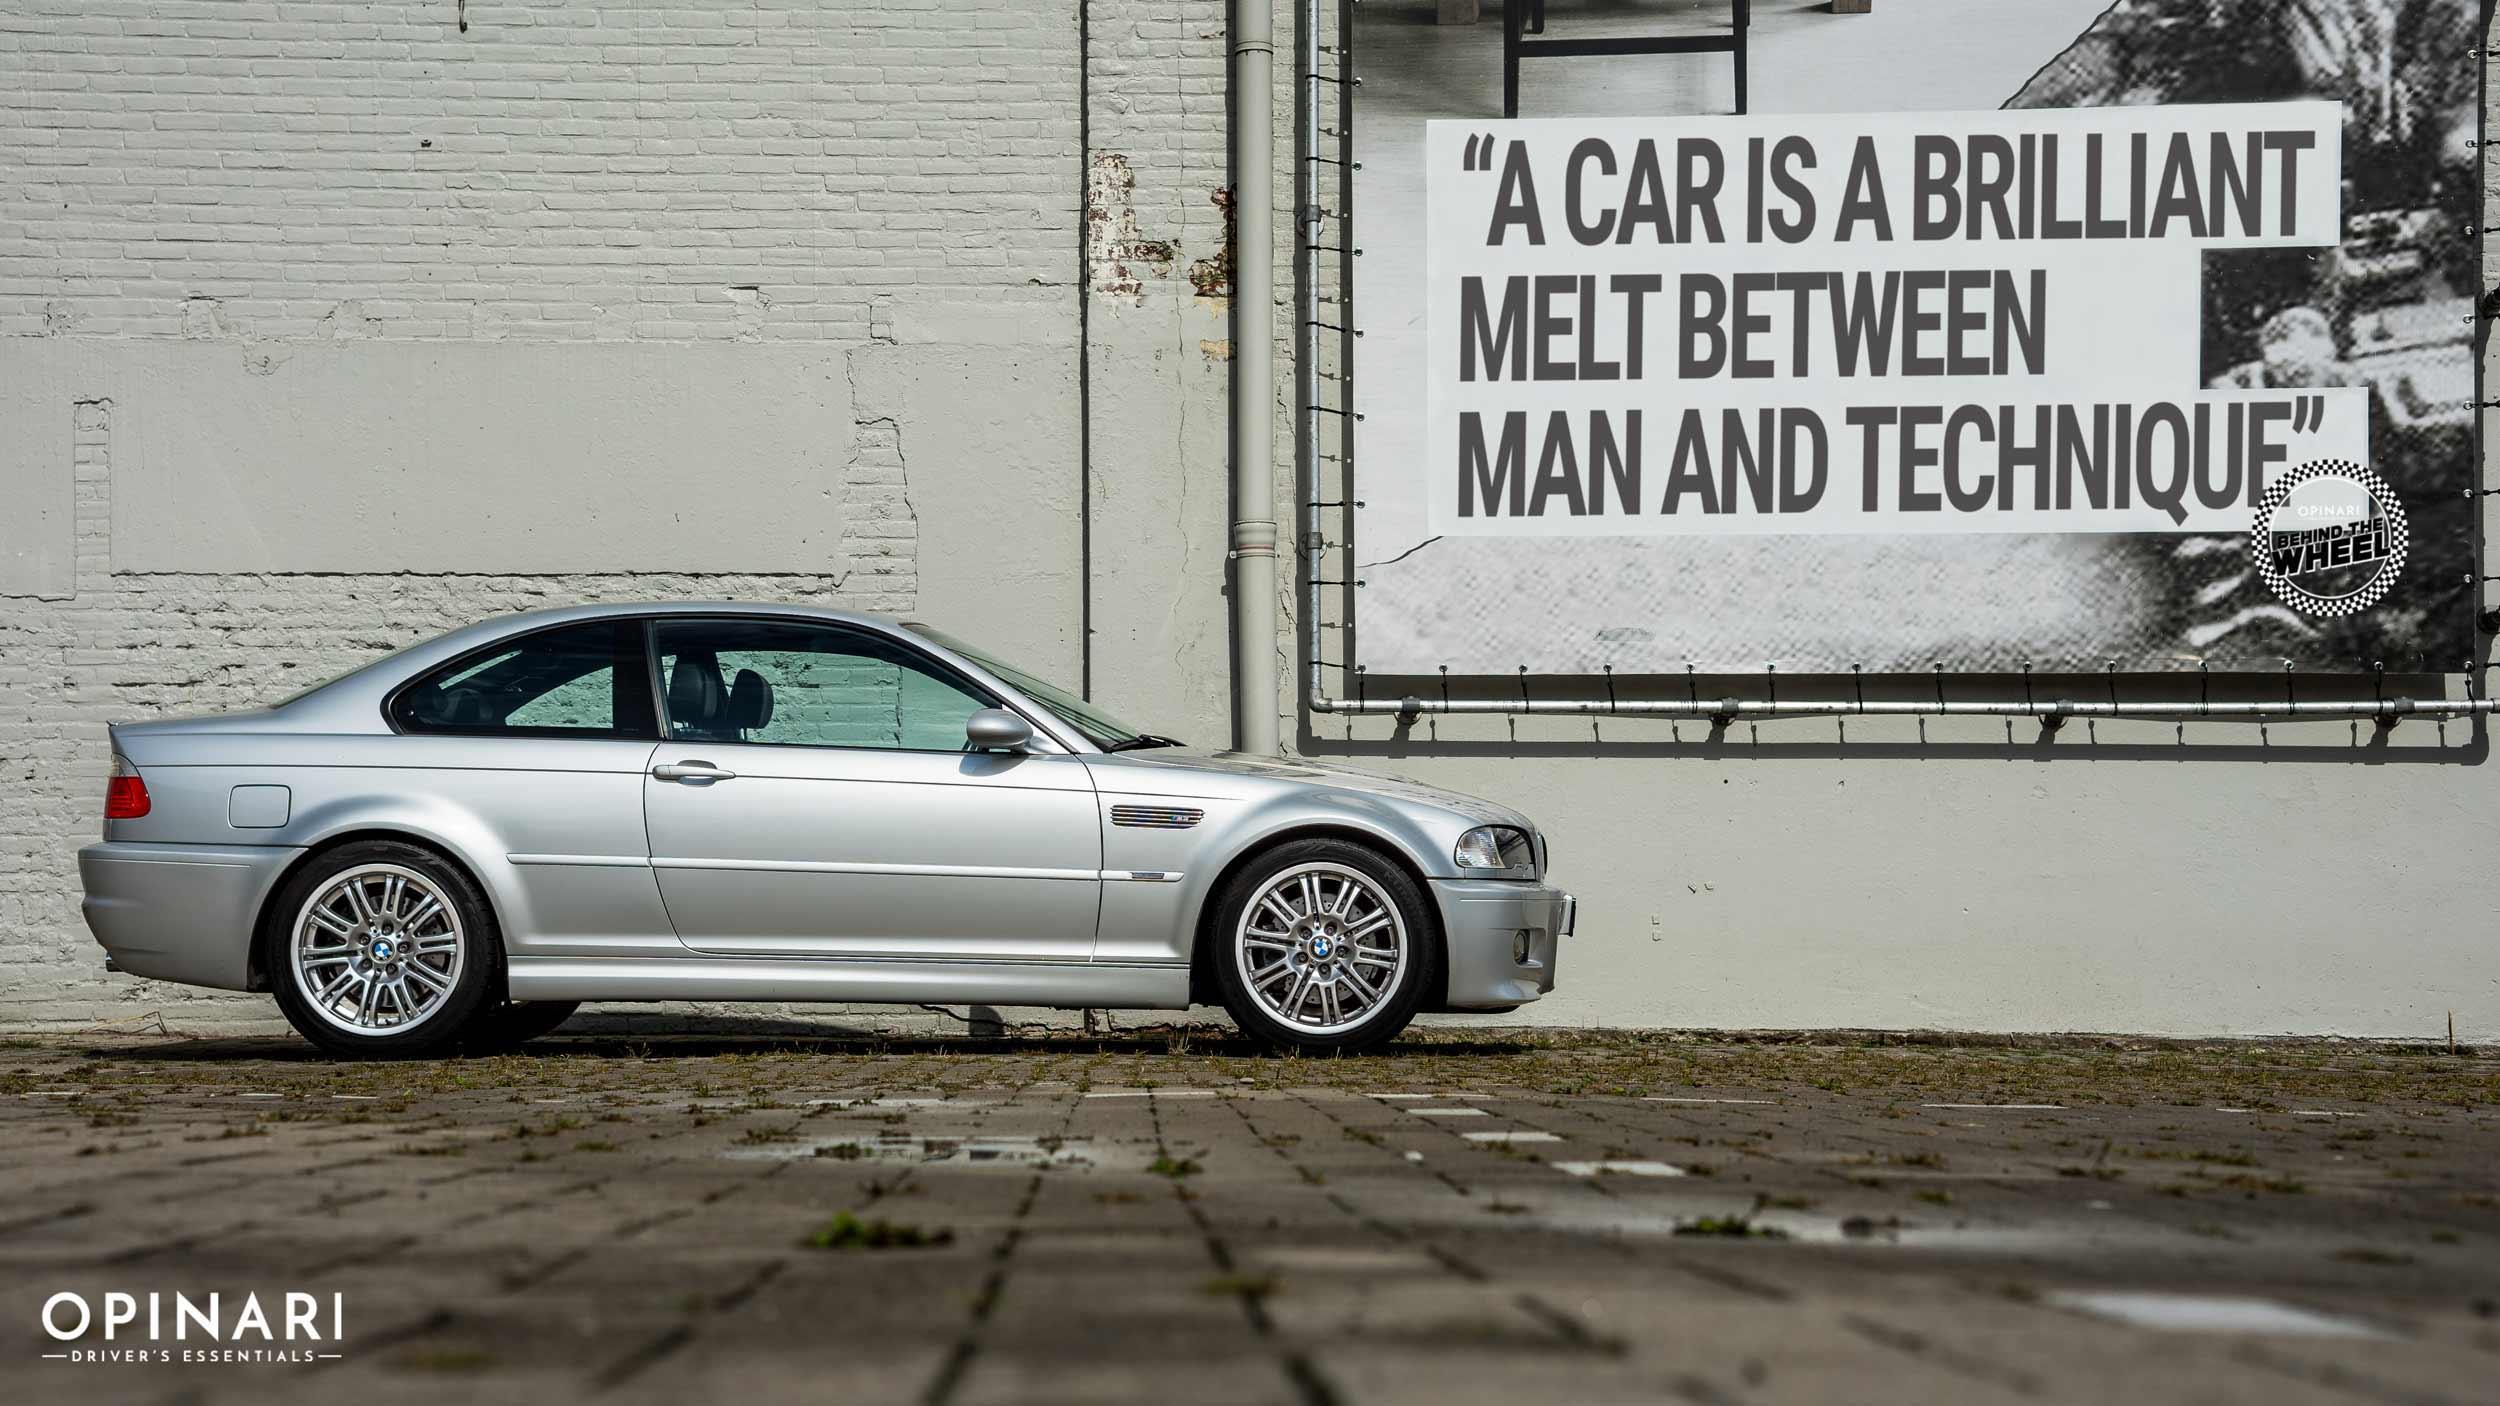 BMW M3 E46 side